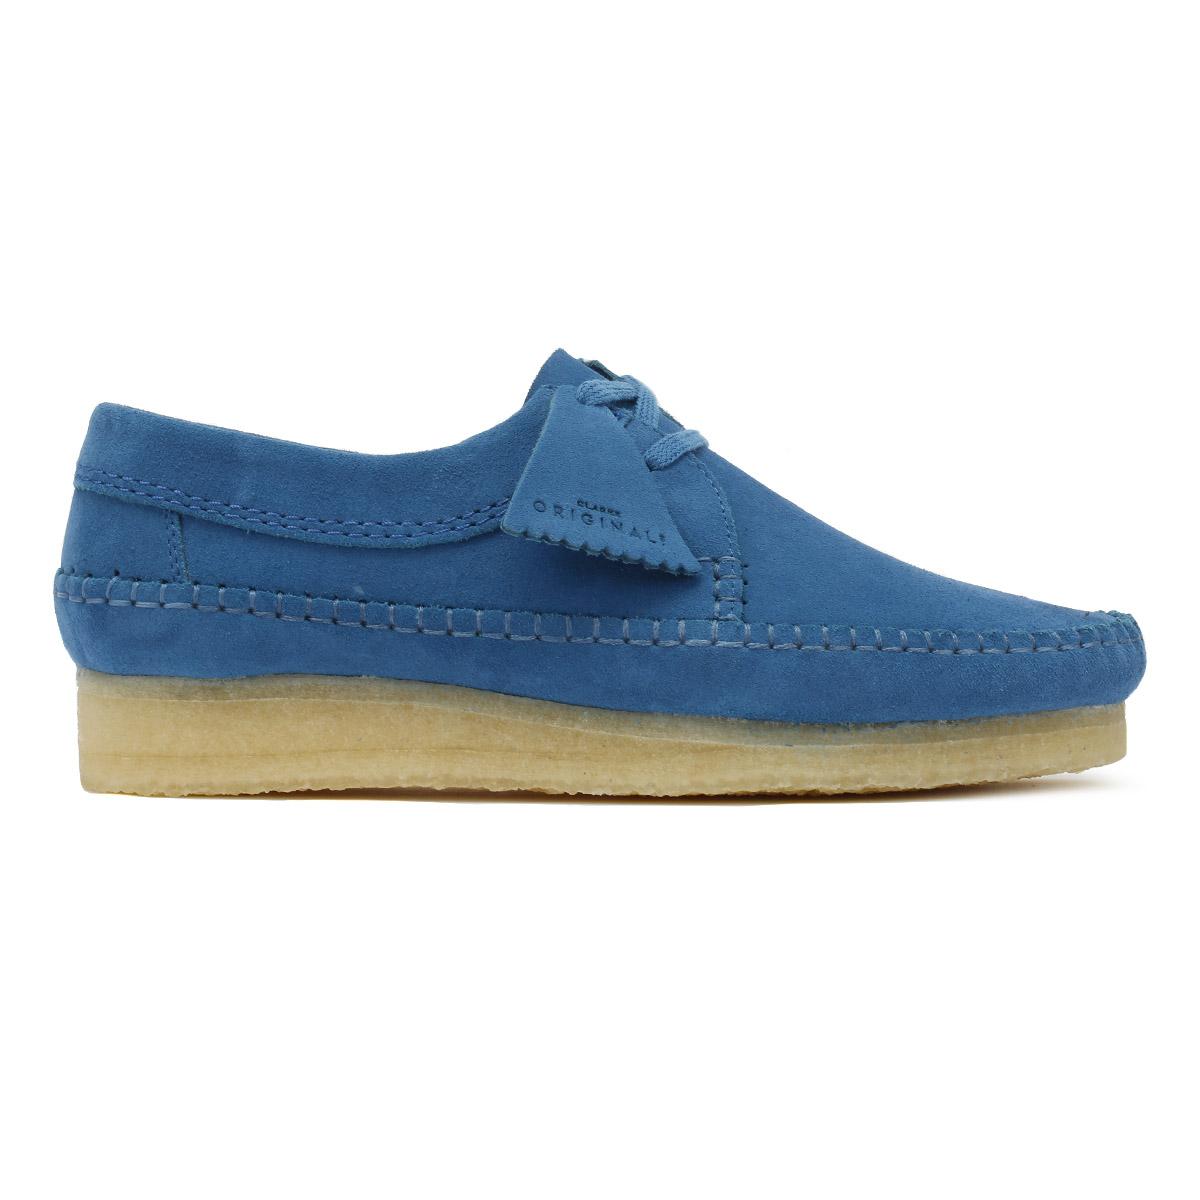 Clarks Originals daim homme Ocean Blue Weaver Chaussures en daim Originals 39ea43